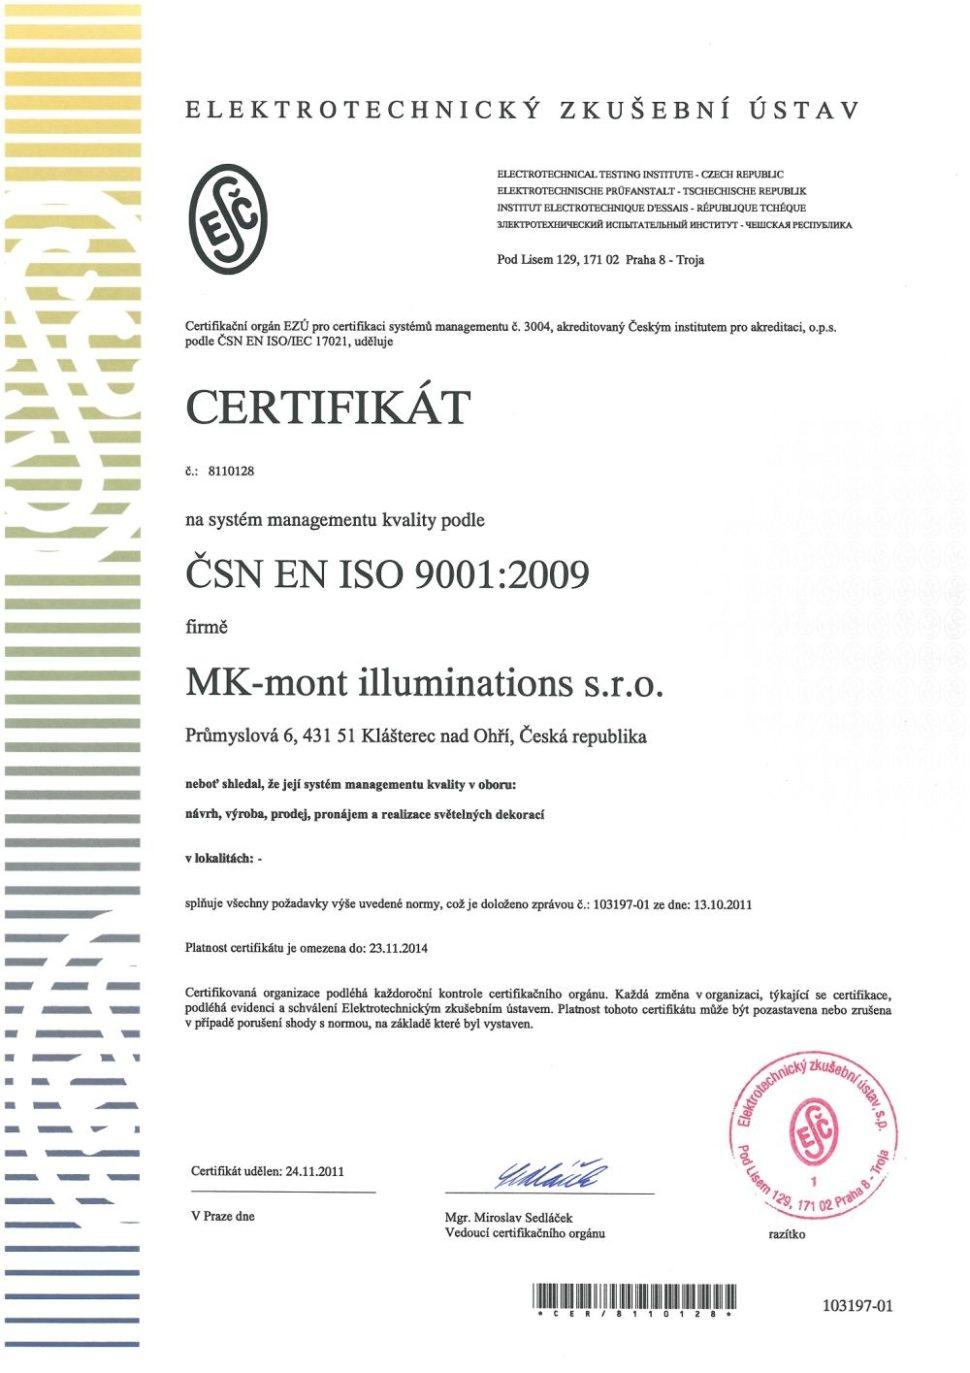 MK mont certifikát ISO 9001